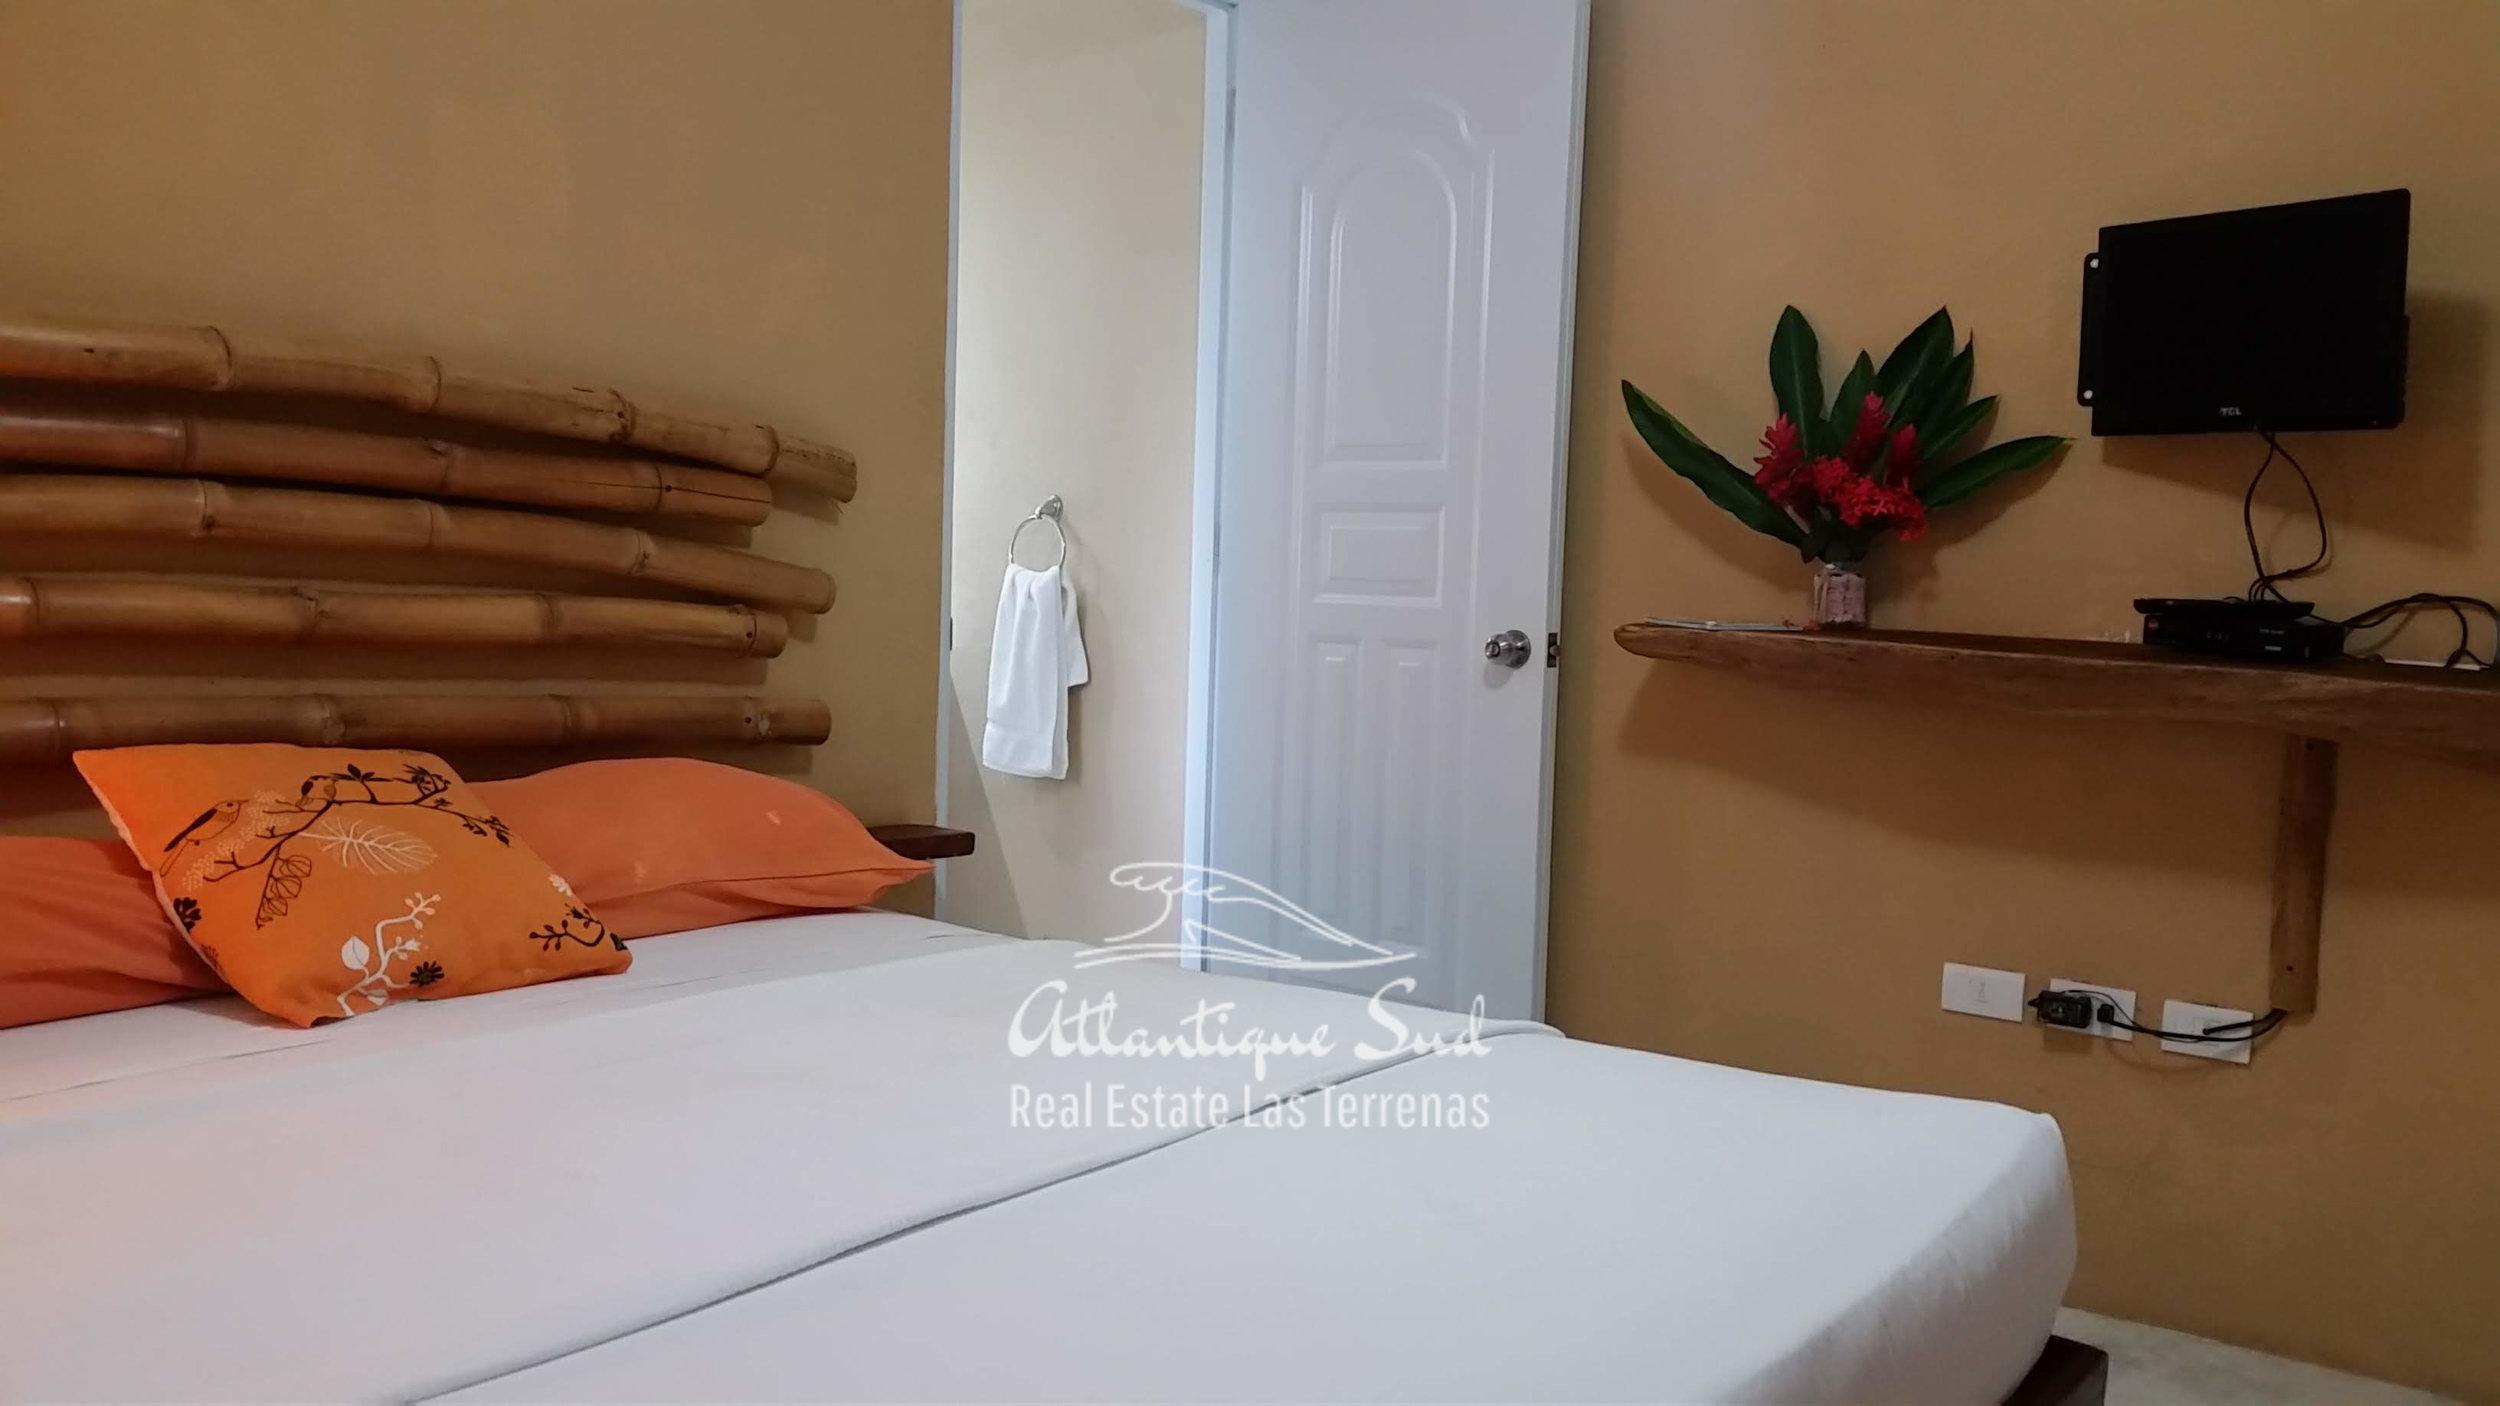 Typical caribbean hotel for sale Real Estate Las Terrenas Dominican Republic Atlantique Sud10.jpg